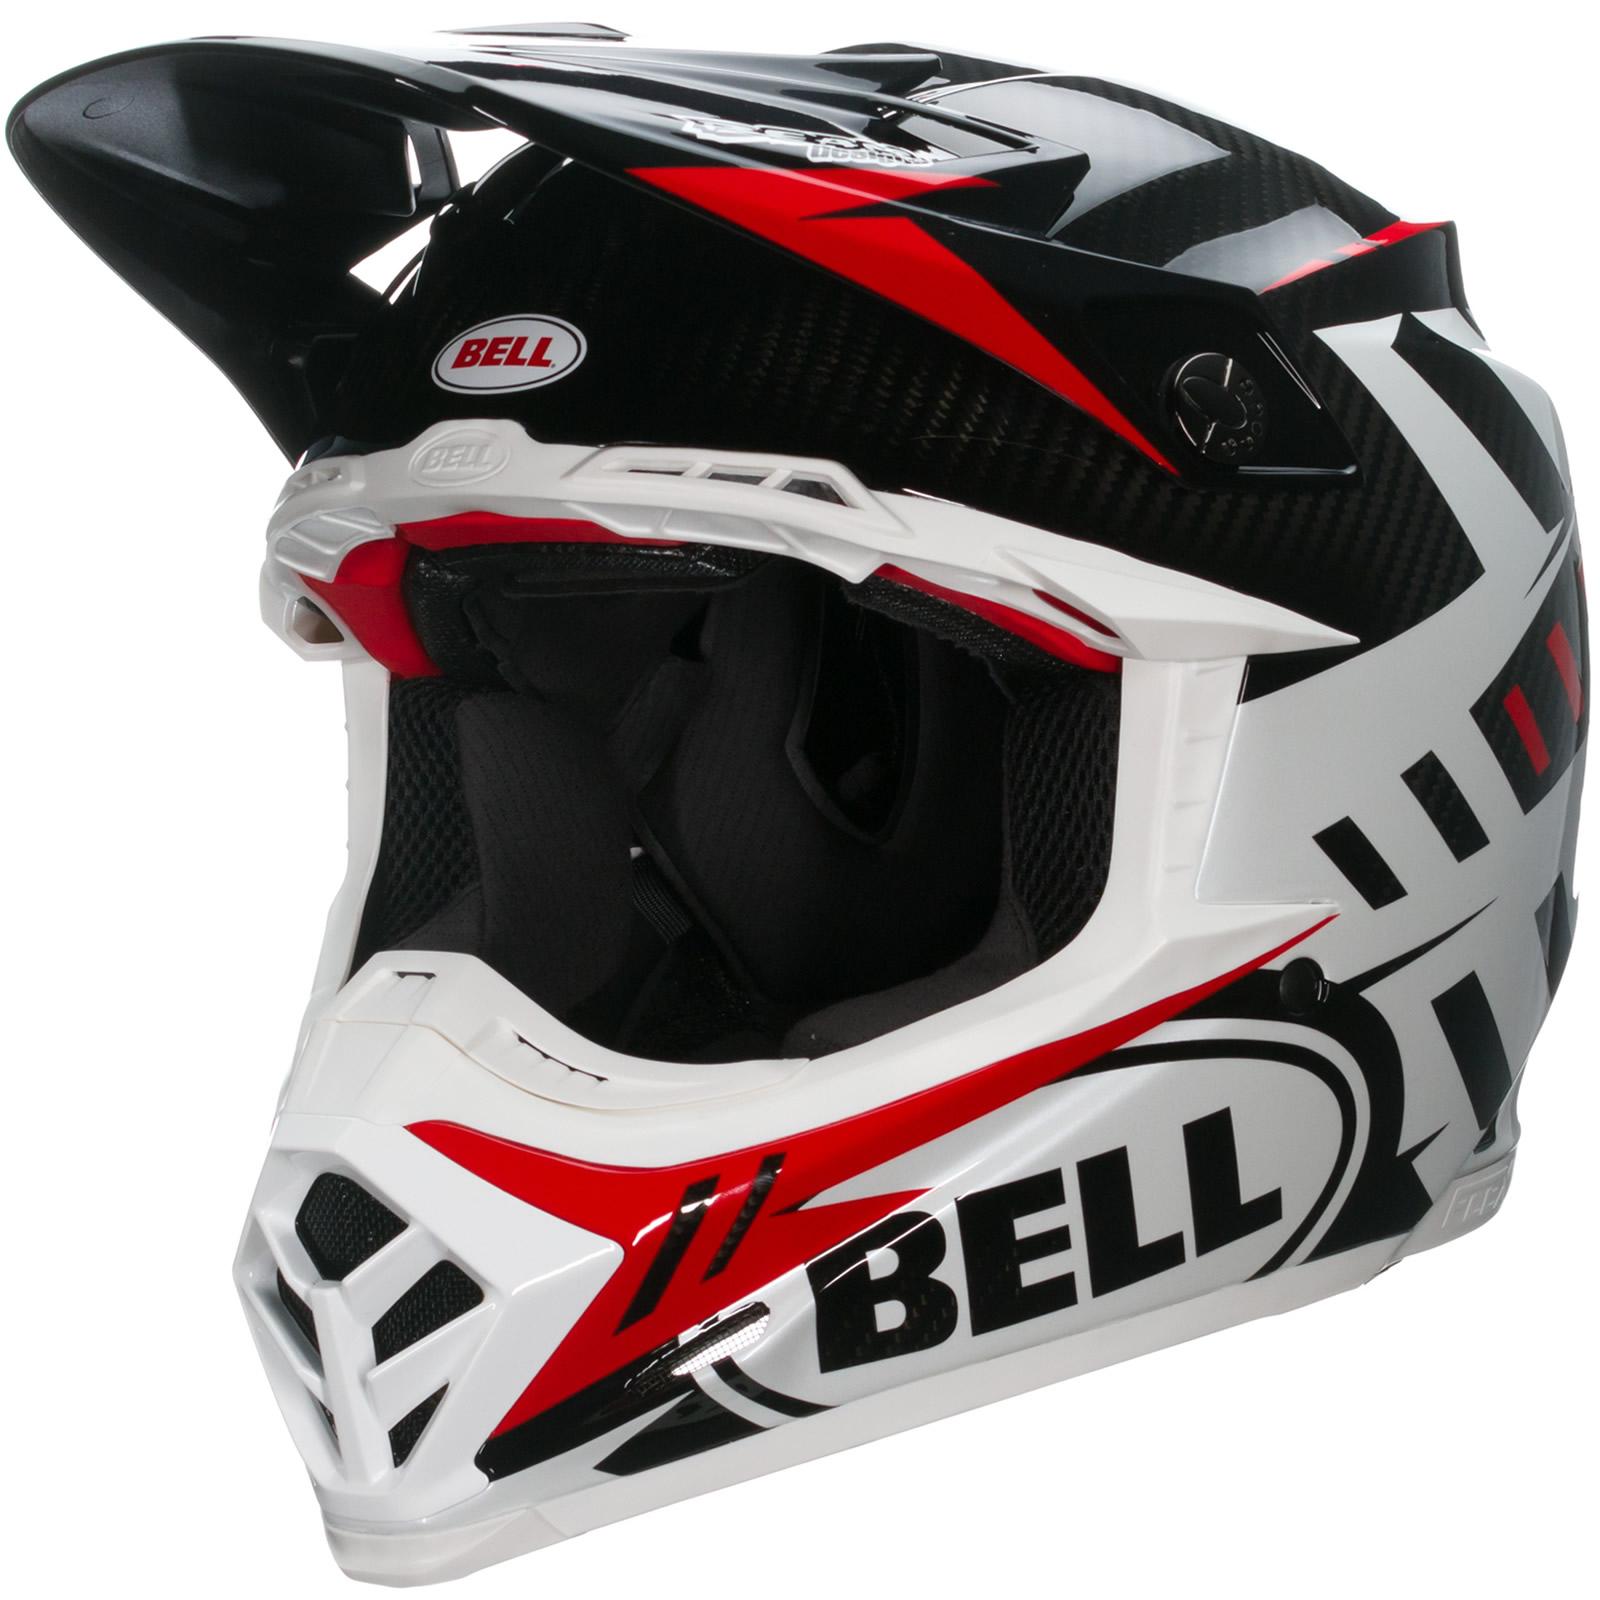 bell moto 9 carbon flex syndrome red motocross enduro racing quad mx protection ebay. Black Bedroom Furniture Sets. Home Design Ideas